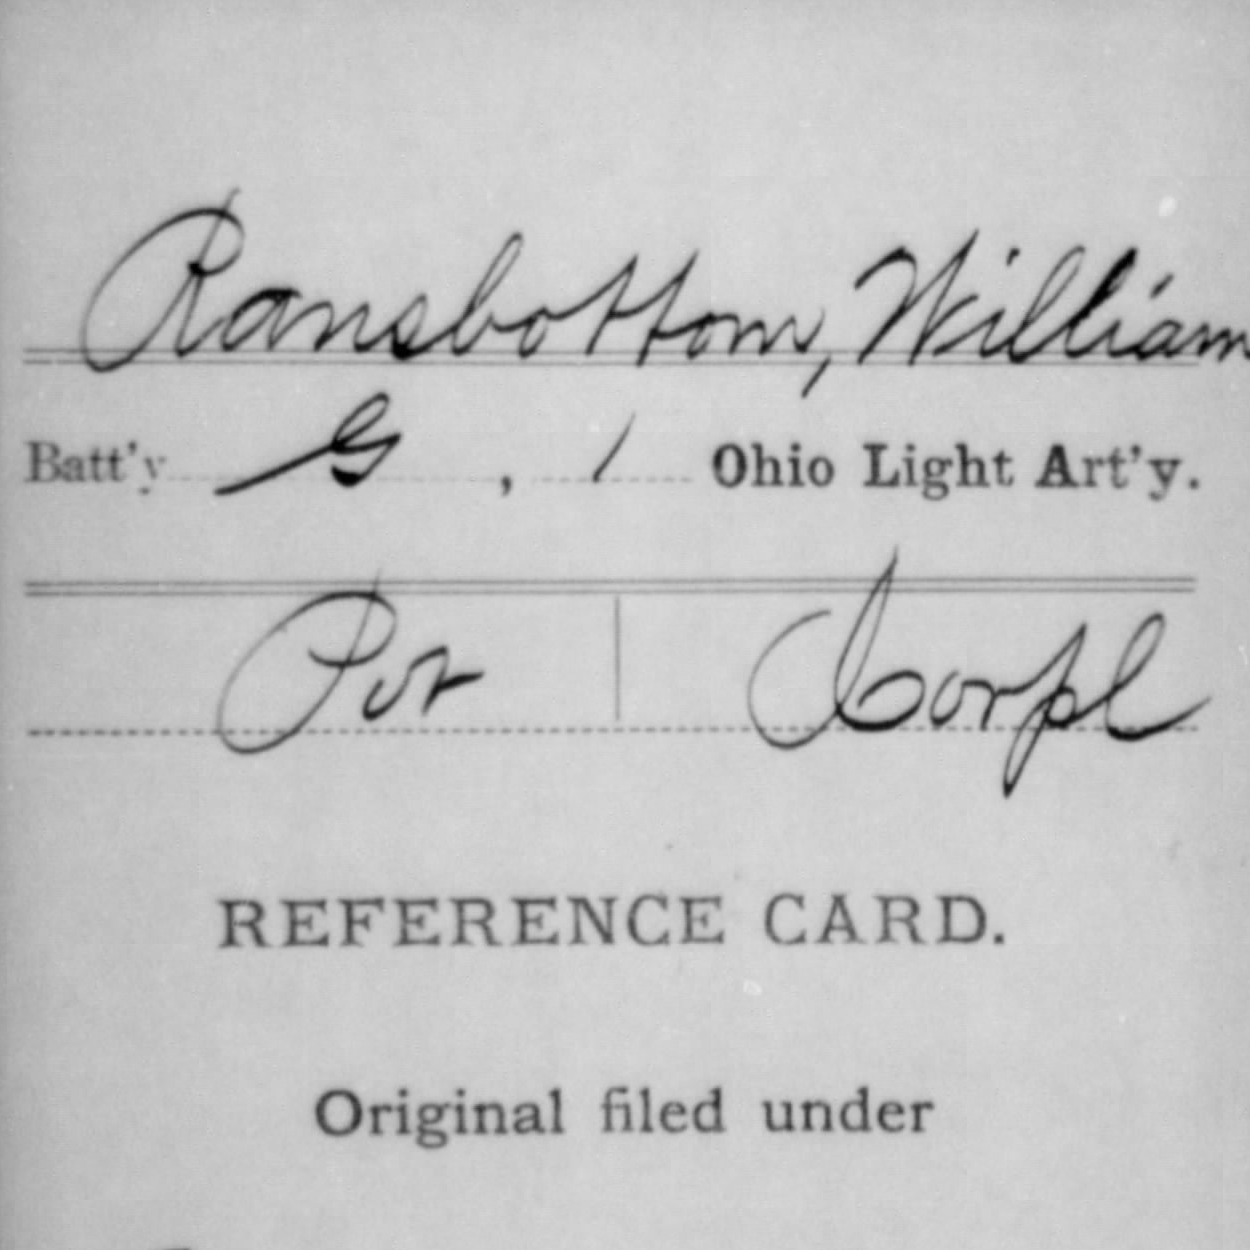 Cpl. William Ransbottom, Co. G, 1st OH Light Artillery, USA